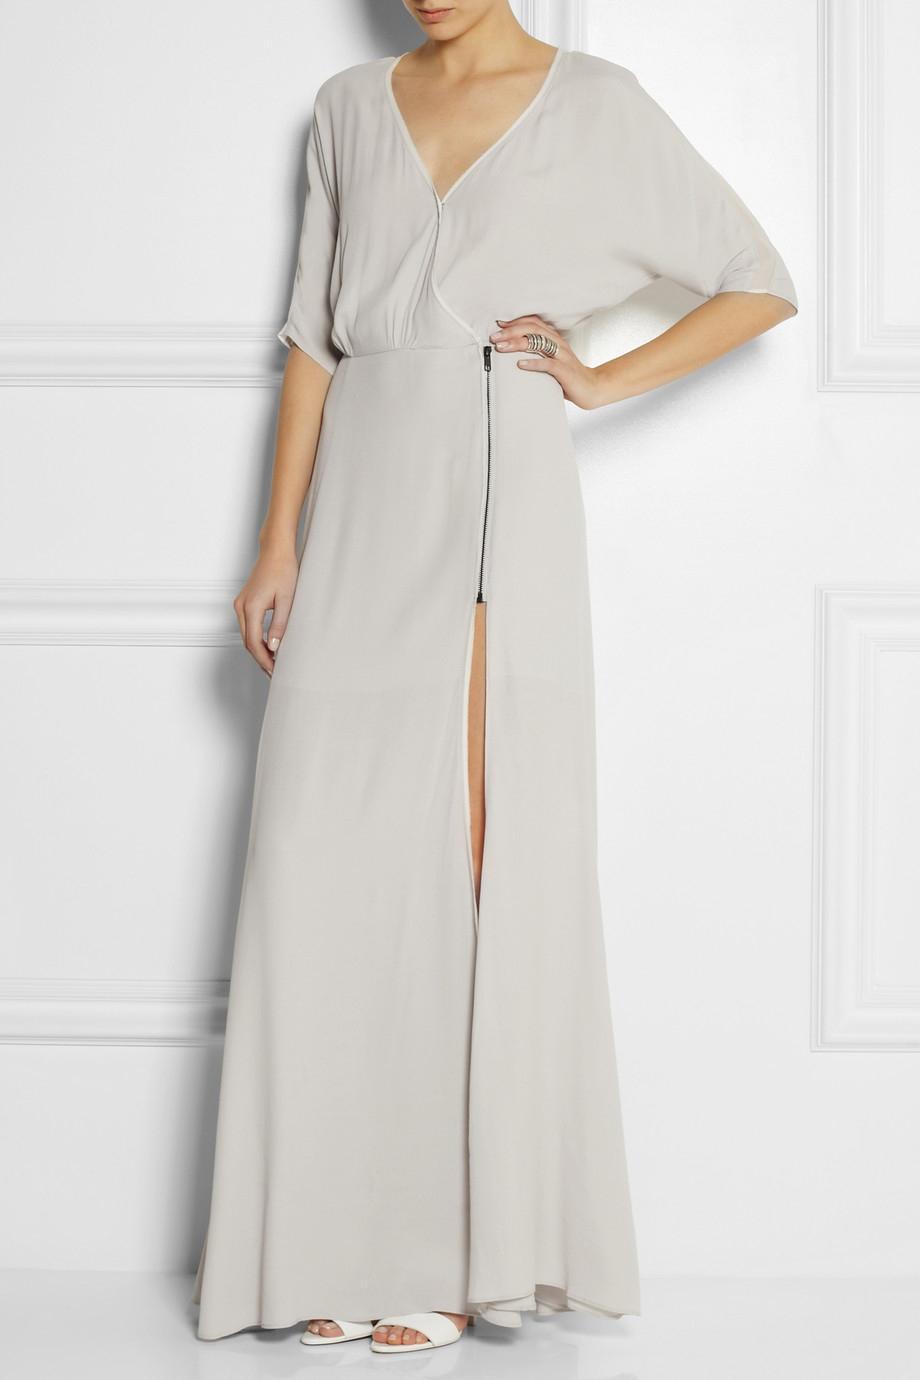 a370d35ccd31 Dagmar Lillian Wrapeffect Crepe Maxi Dress in Gray - Lyst